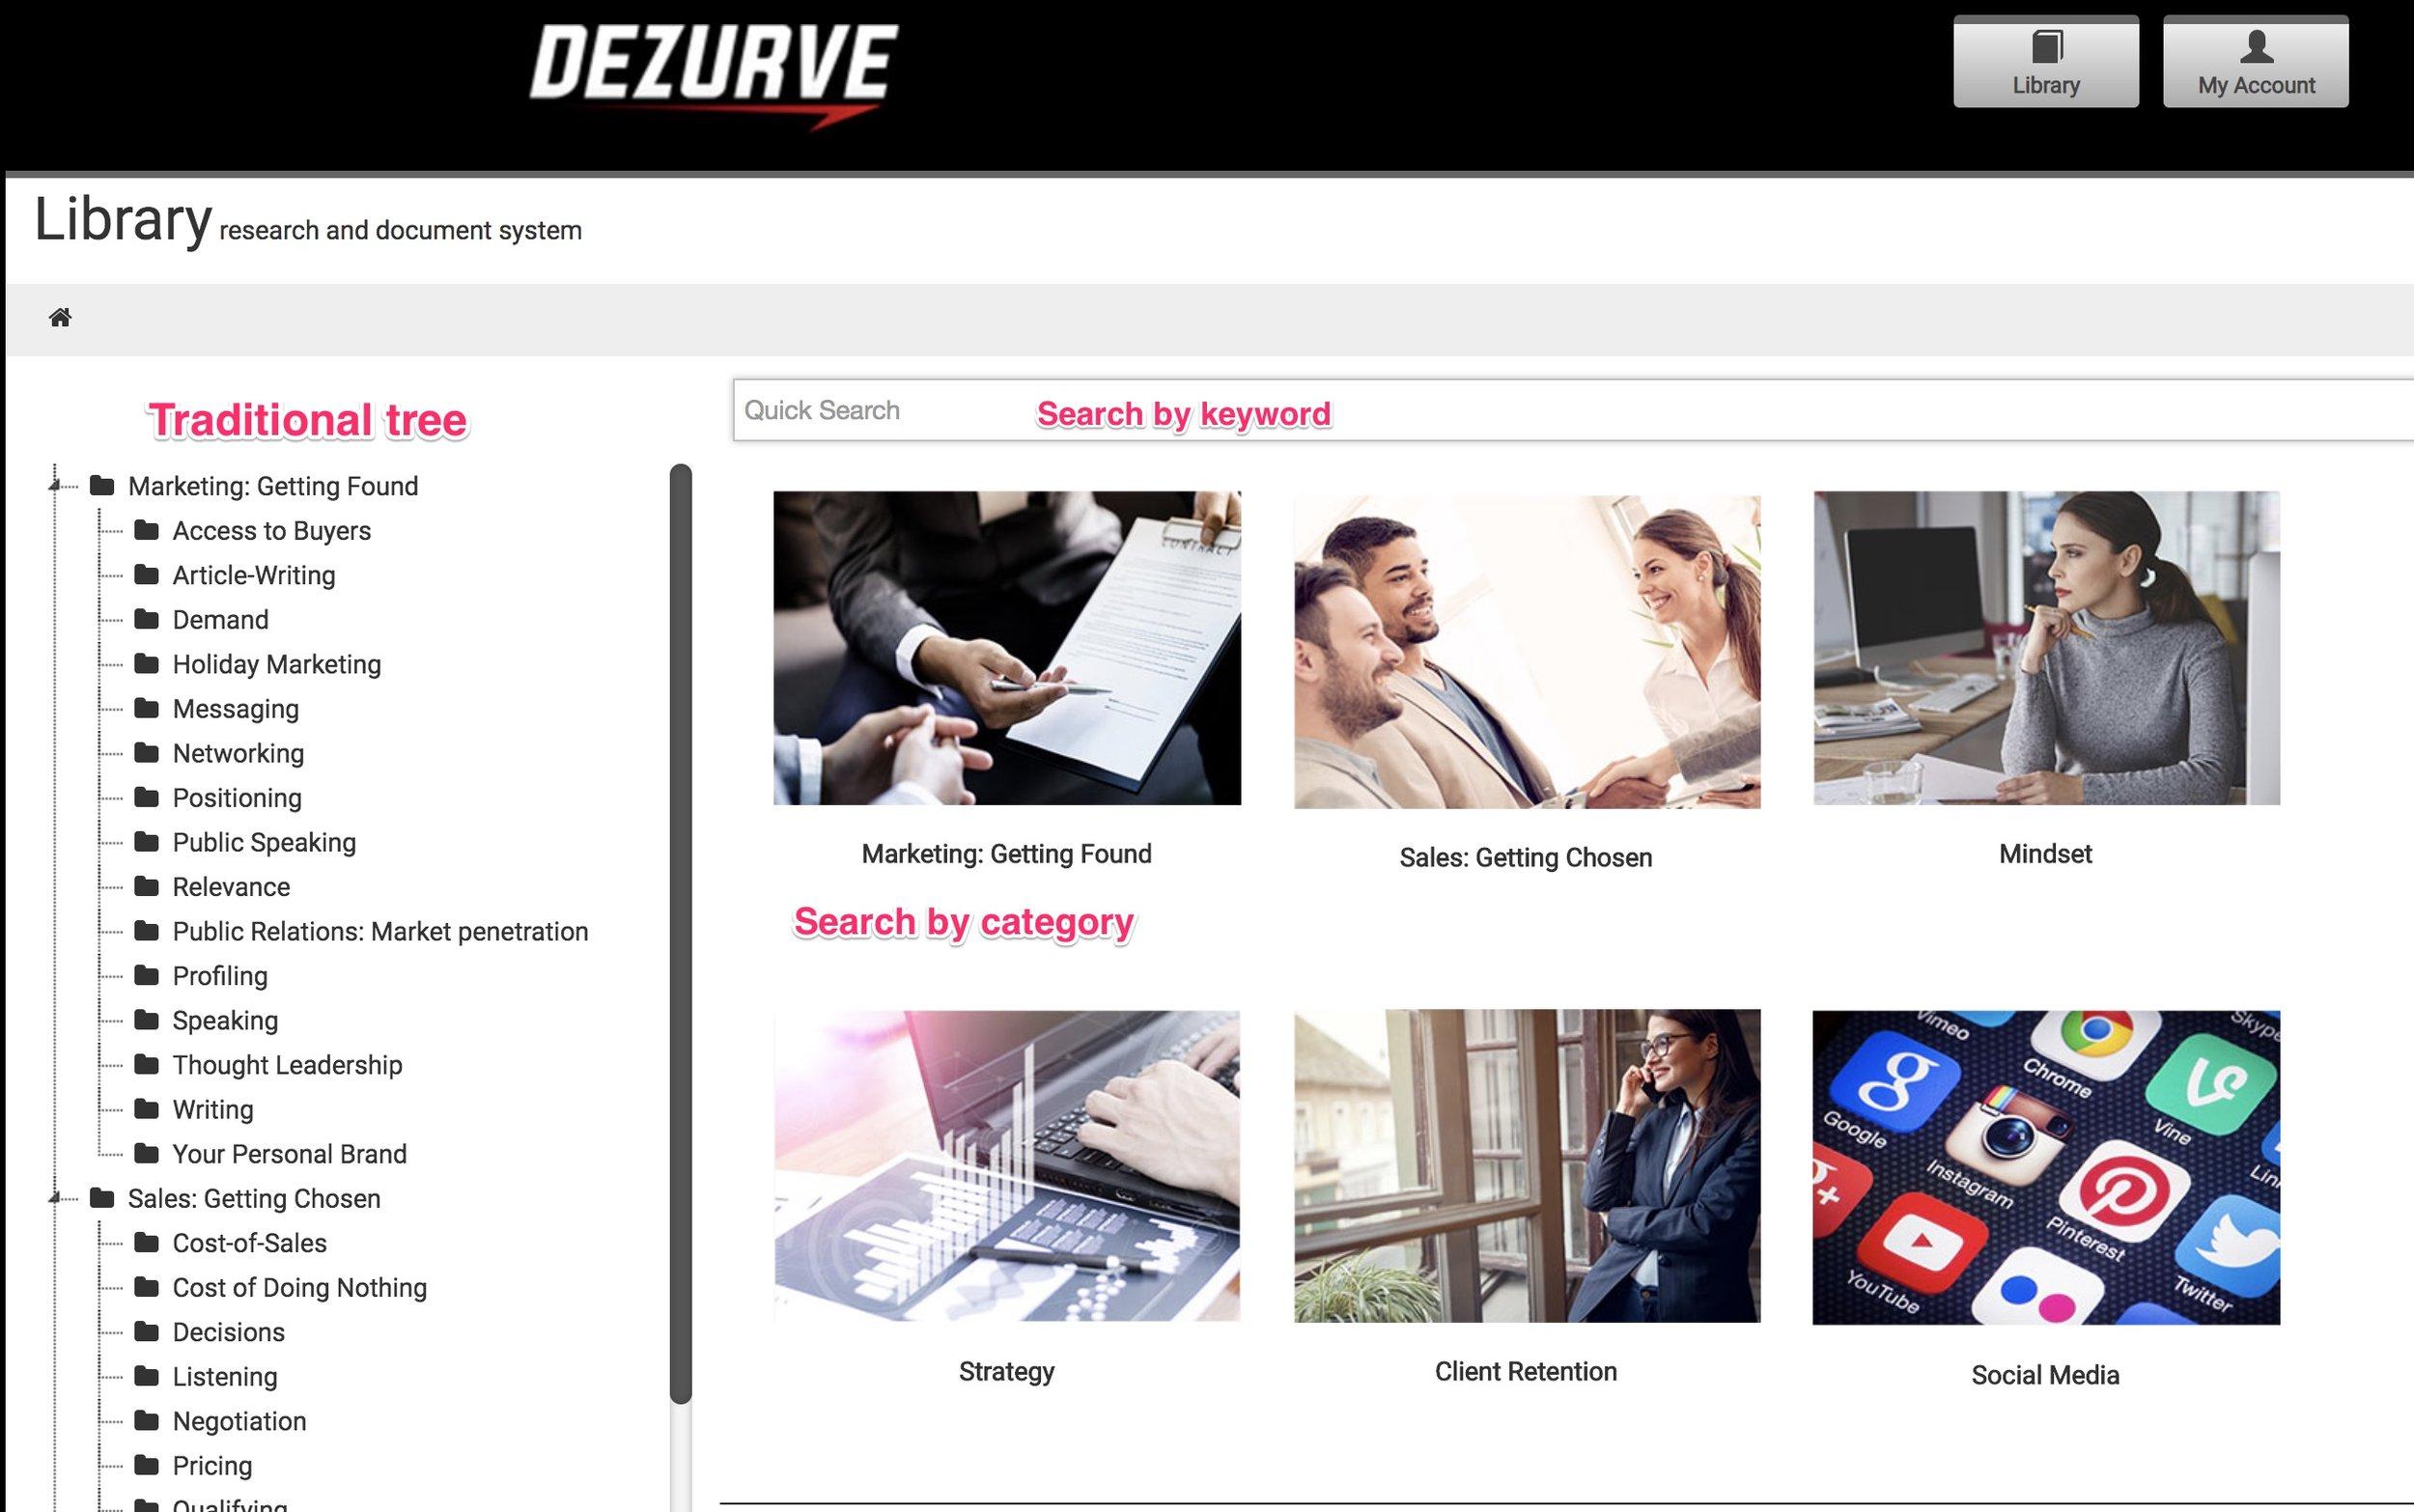 Dezurve_com_-_Library_Page.jpg